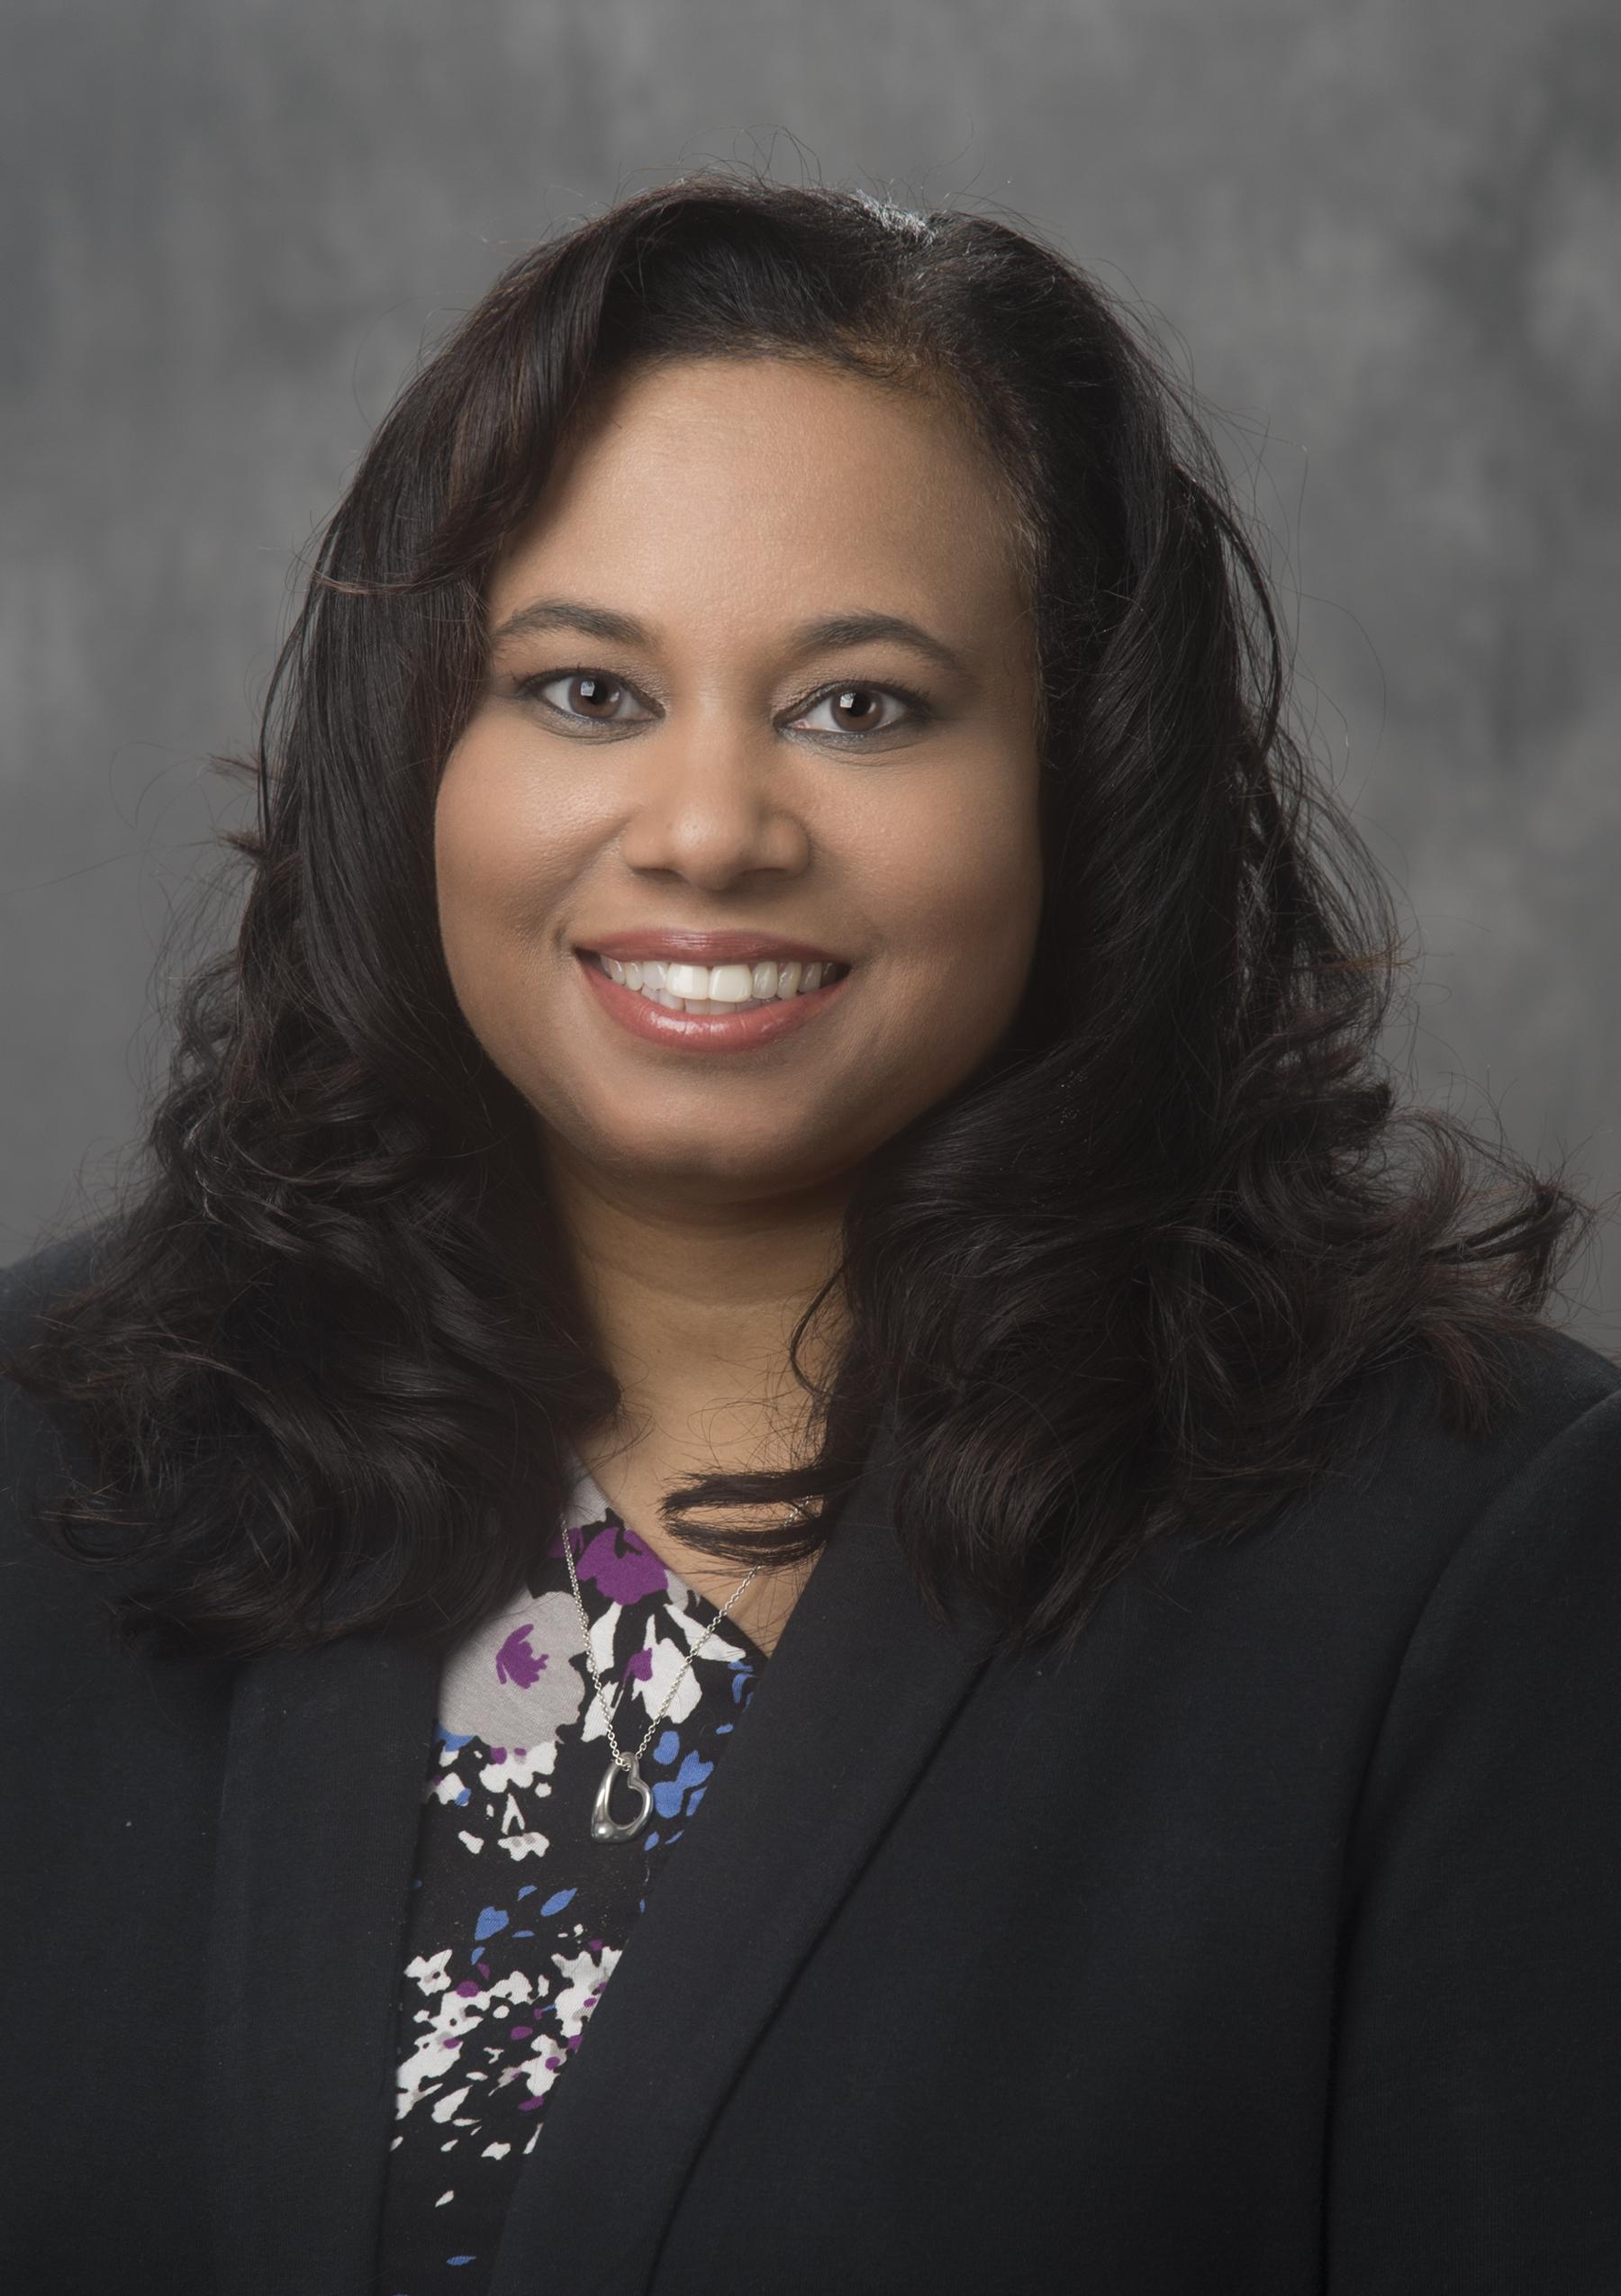 Erika Austin  Manager of Trademarks & Licensing, Purdue Marketing and Media  LinkedIn